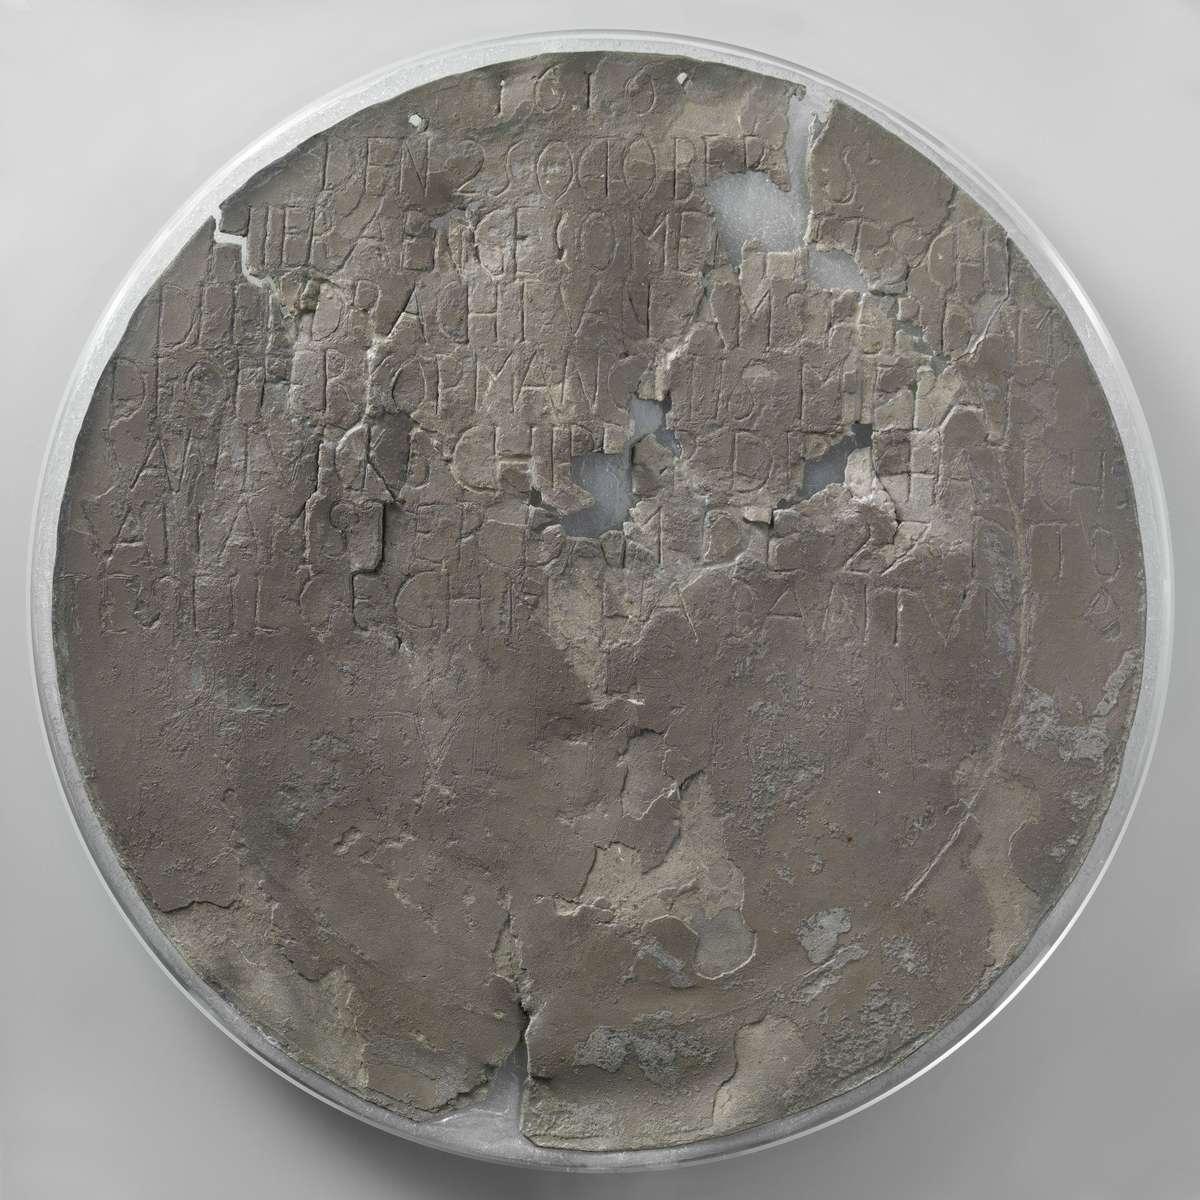 Dirk Hartog plate, 1616. Tin (metal), 36.5 cm (diameter). Reproduced courtesy Rijksmuseum, Amsterdam